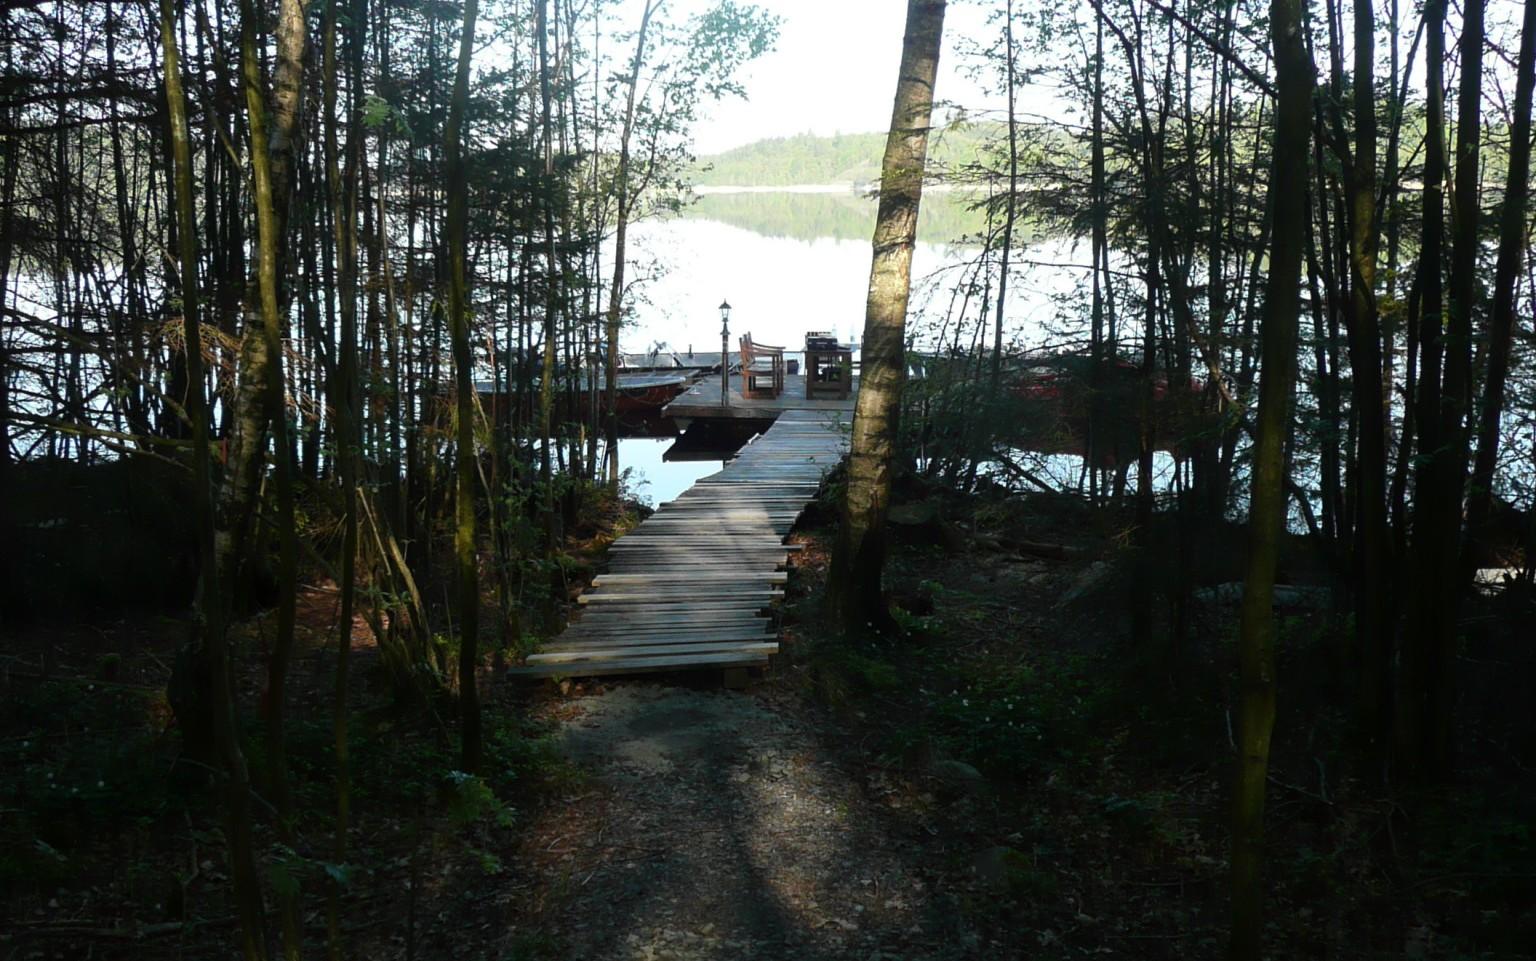 Angeltour Trolling Öresjön Schweden Ferienhaus Bootssteg Trollingboote